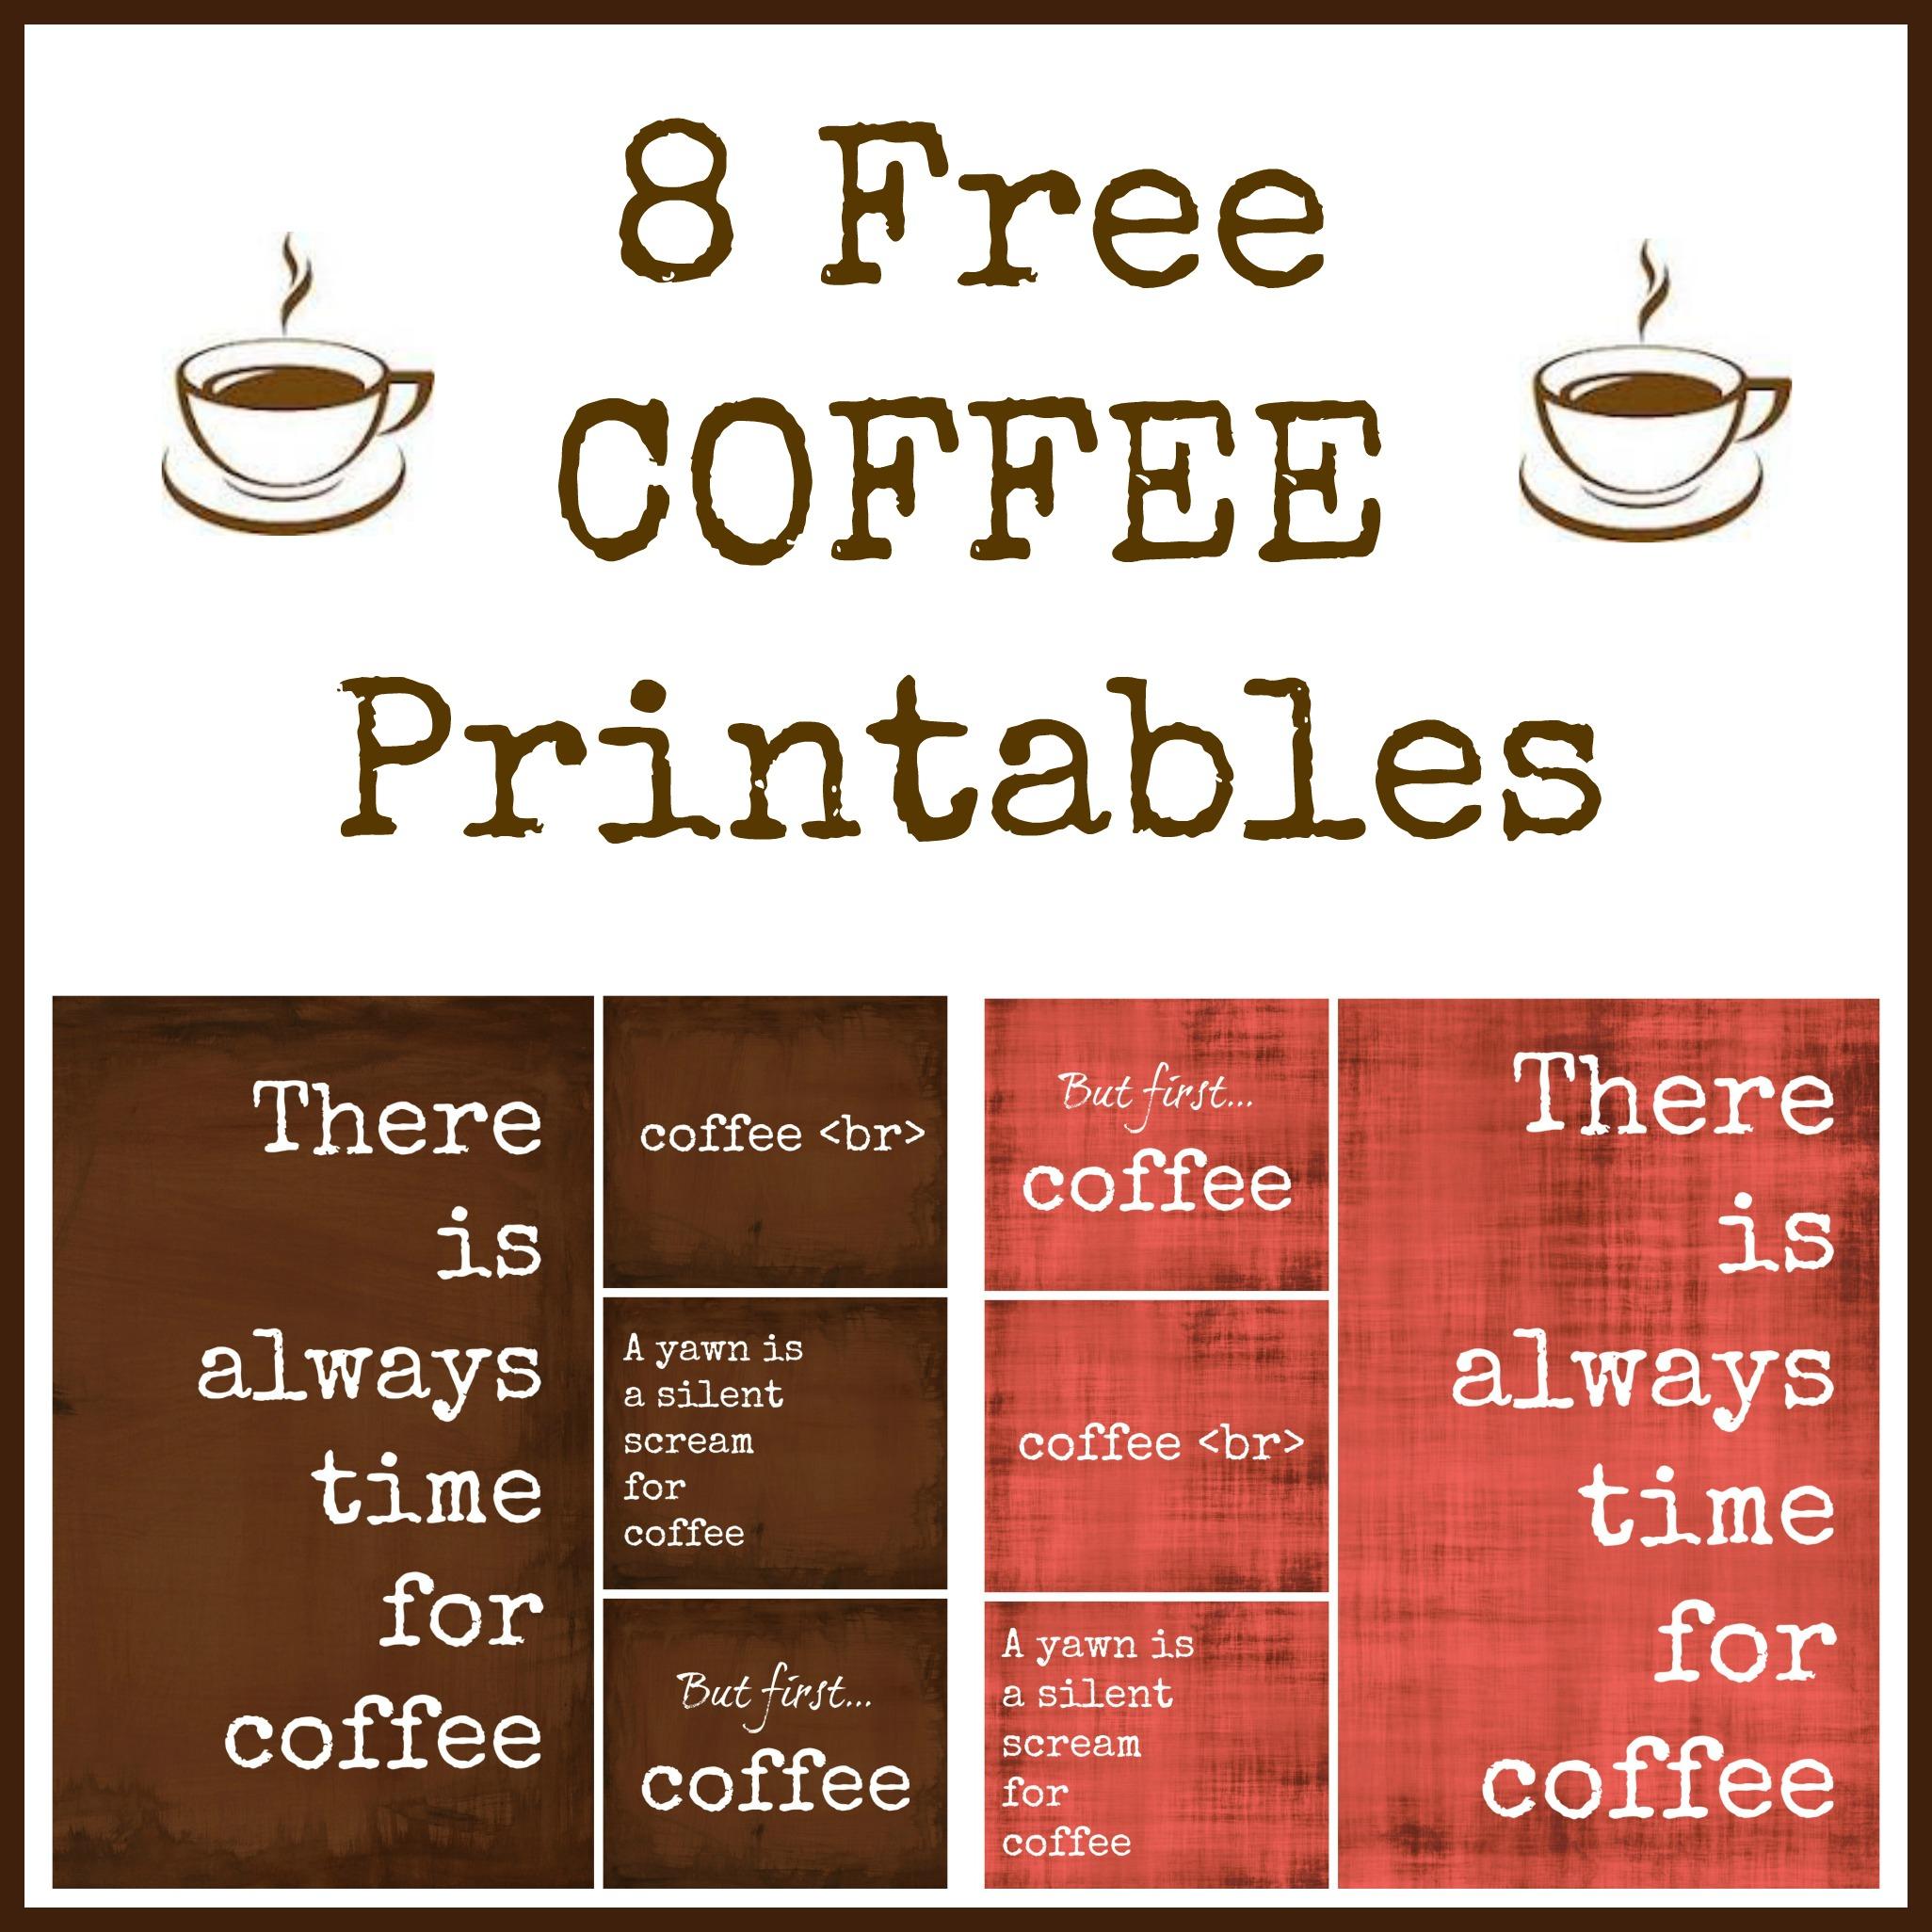 8 Free Coffee Printables - - Free Printable Coffee Bar Signs